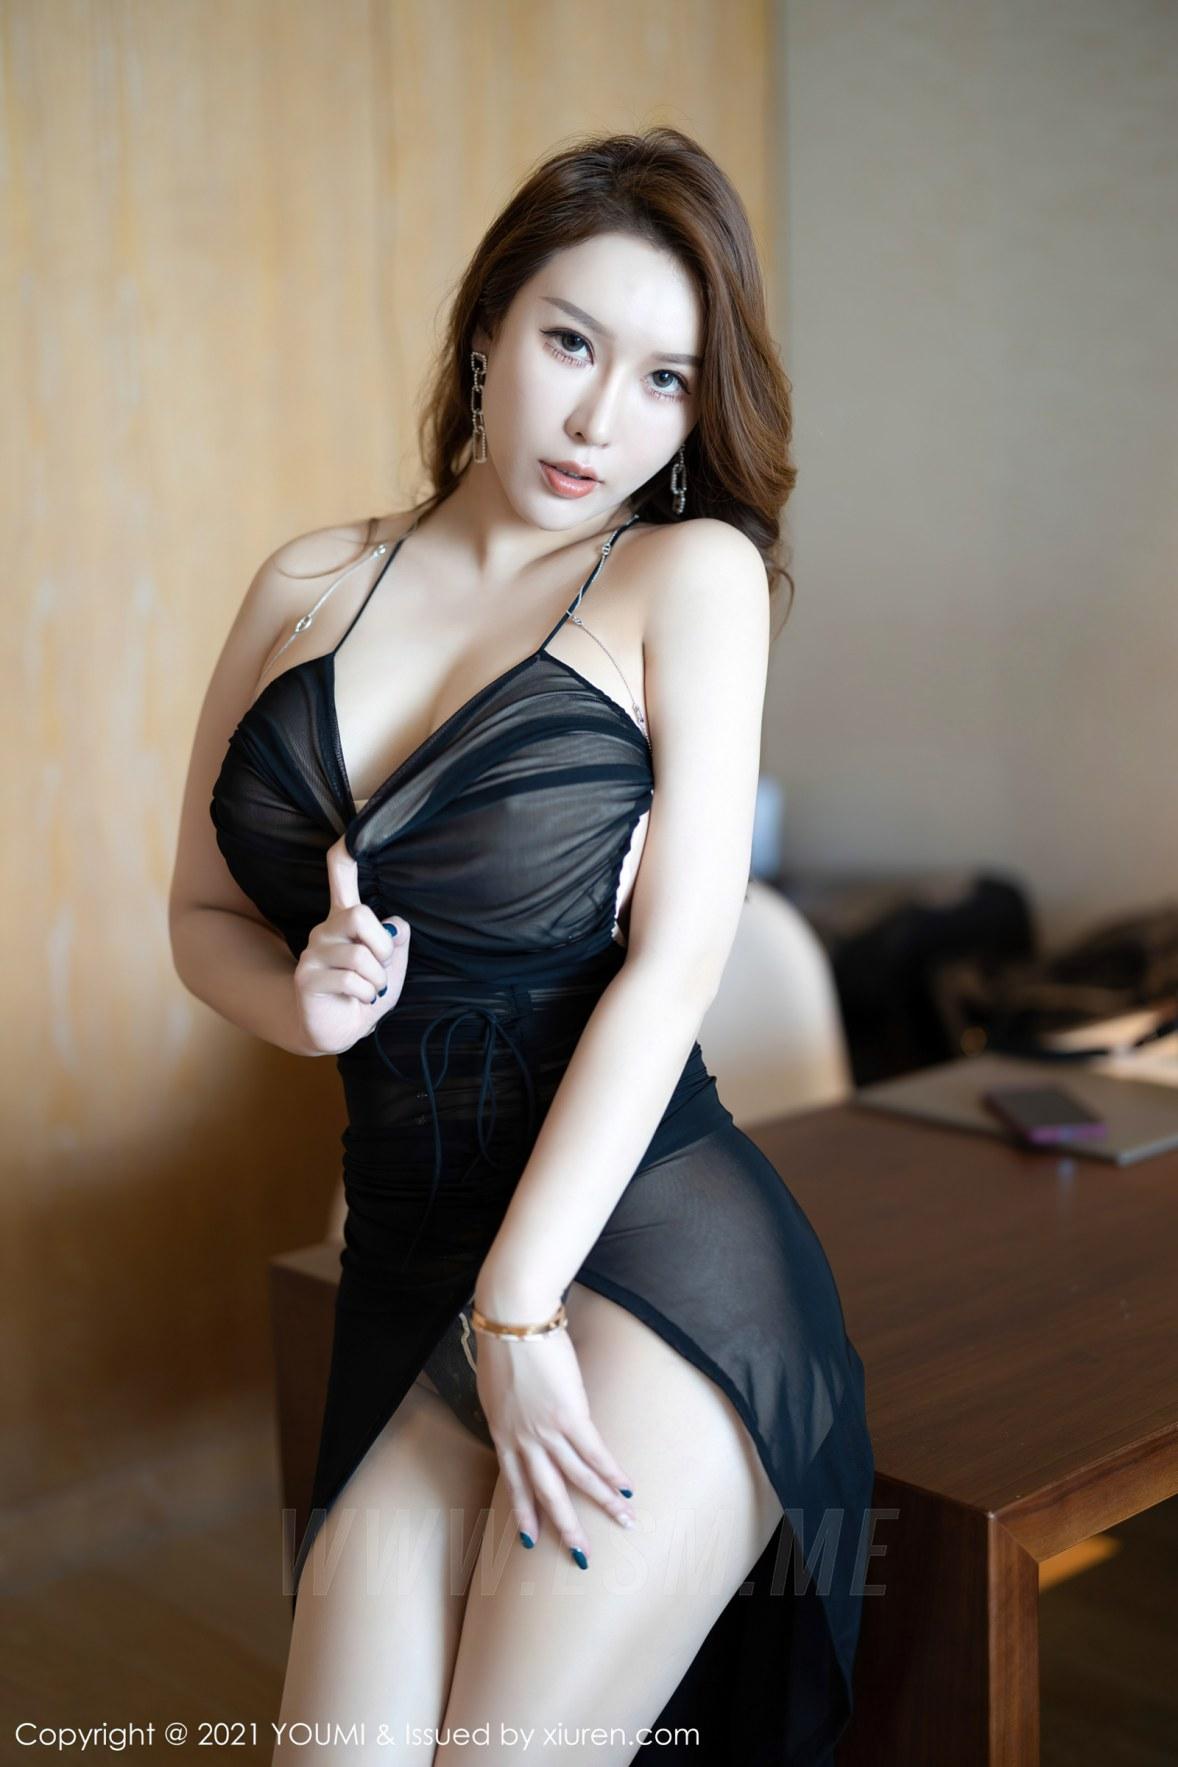 YOUMI 尤蜜荟 Vol.583 熟女翘臀 尤妮丝 薄透魅惑 - 1